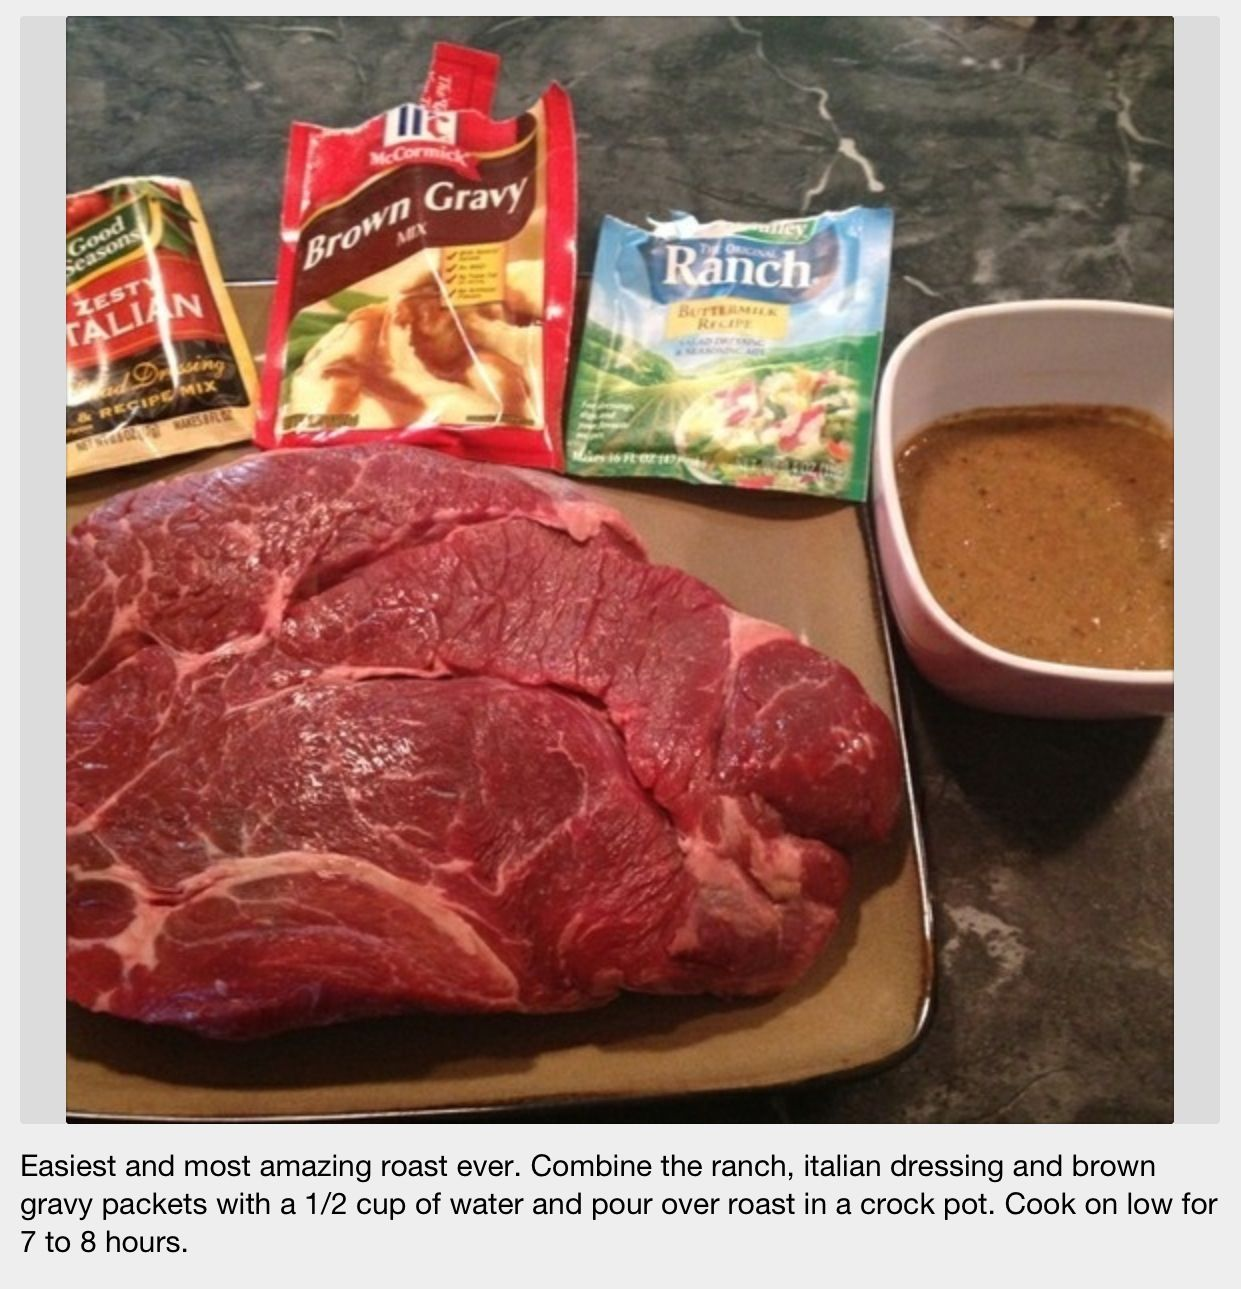 Most Amazing And Super Easy Pot Roast In A Slow Cooker Recipe Pot Roast Recipes Good Roasts Recipes